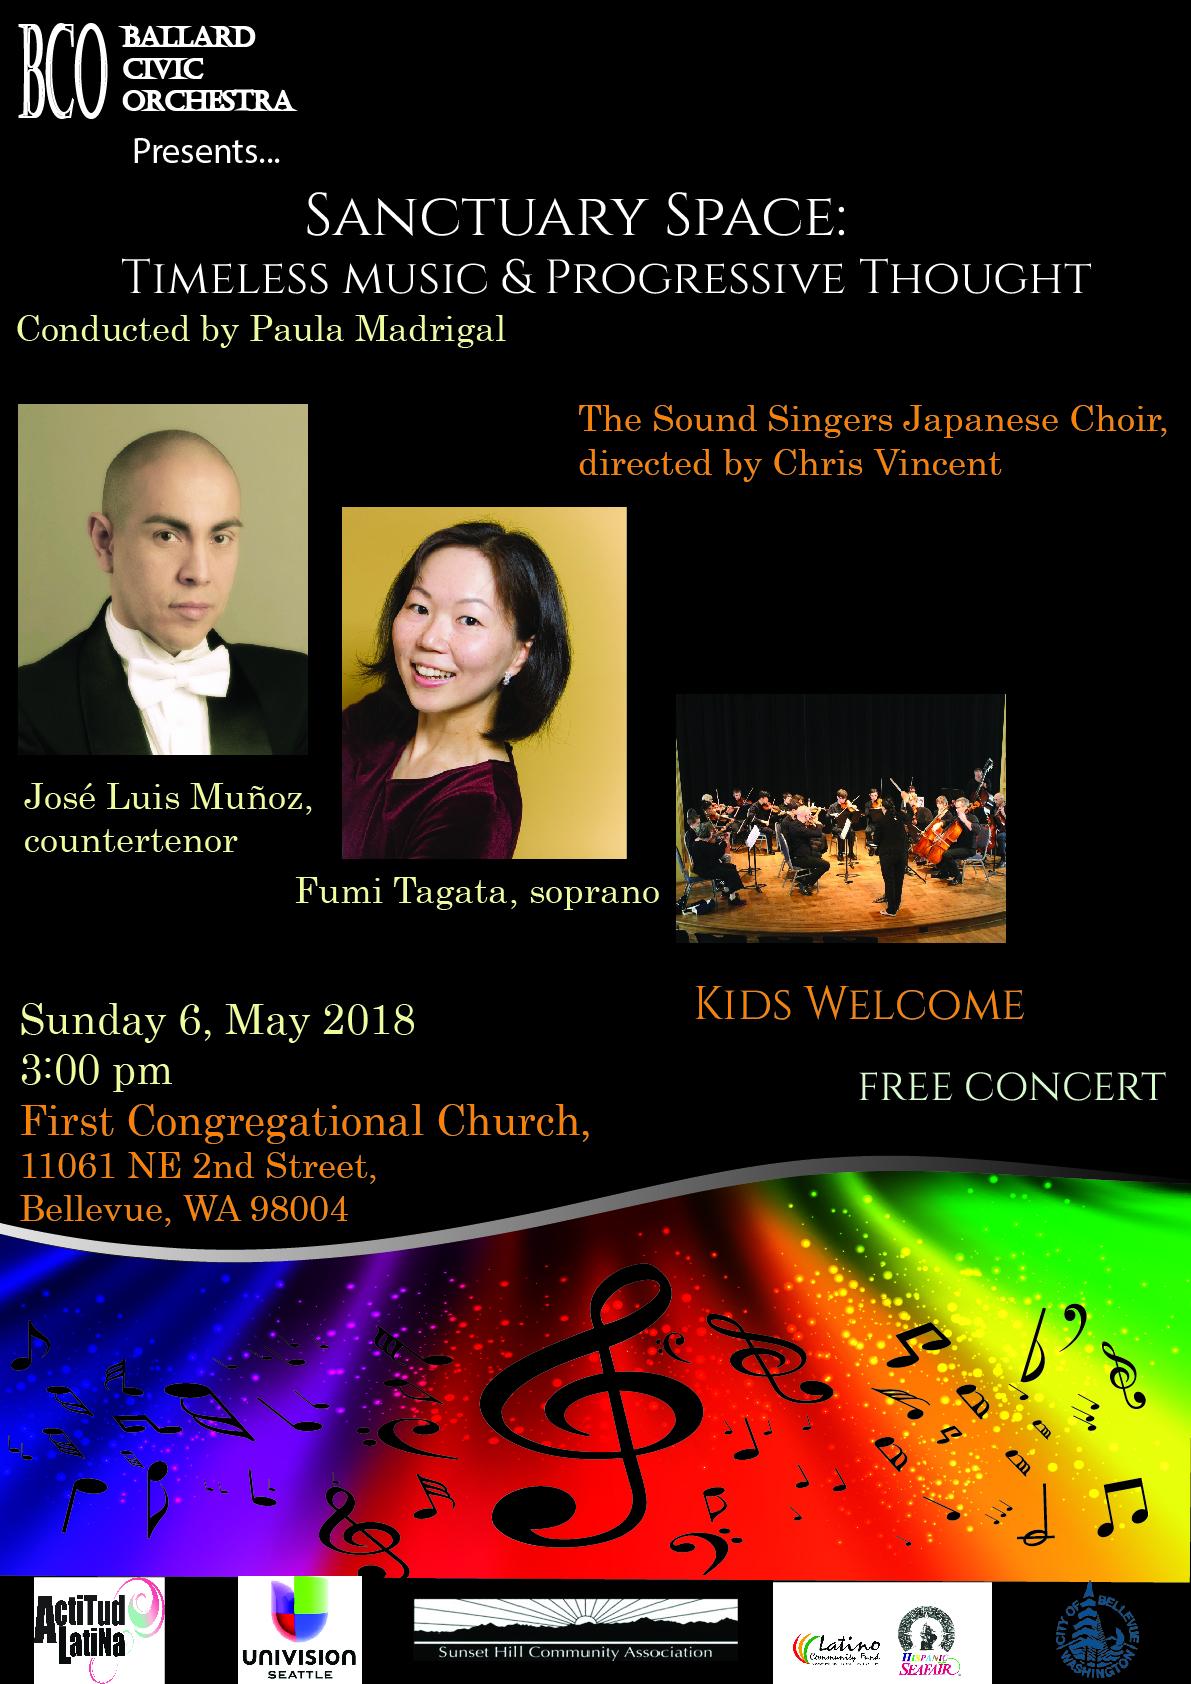 Ballard Civic Orchestra Concert 5/6/18